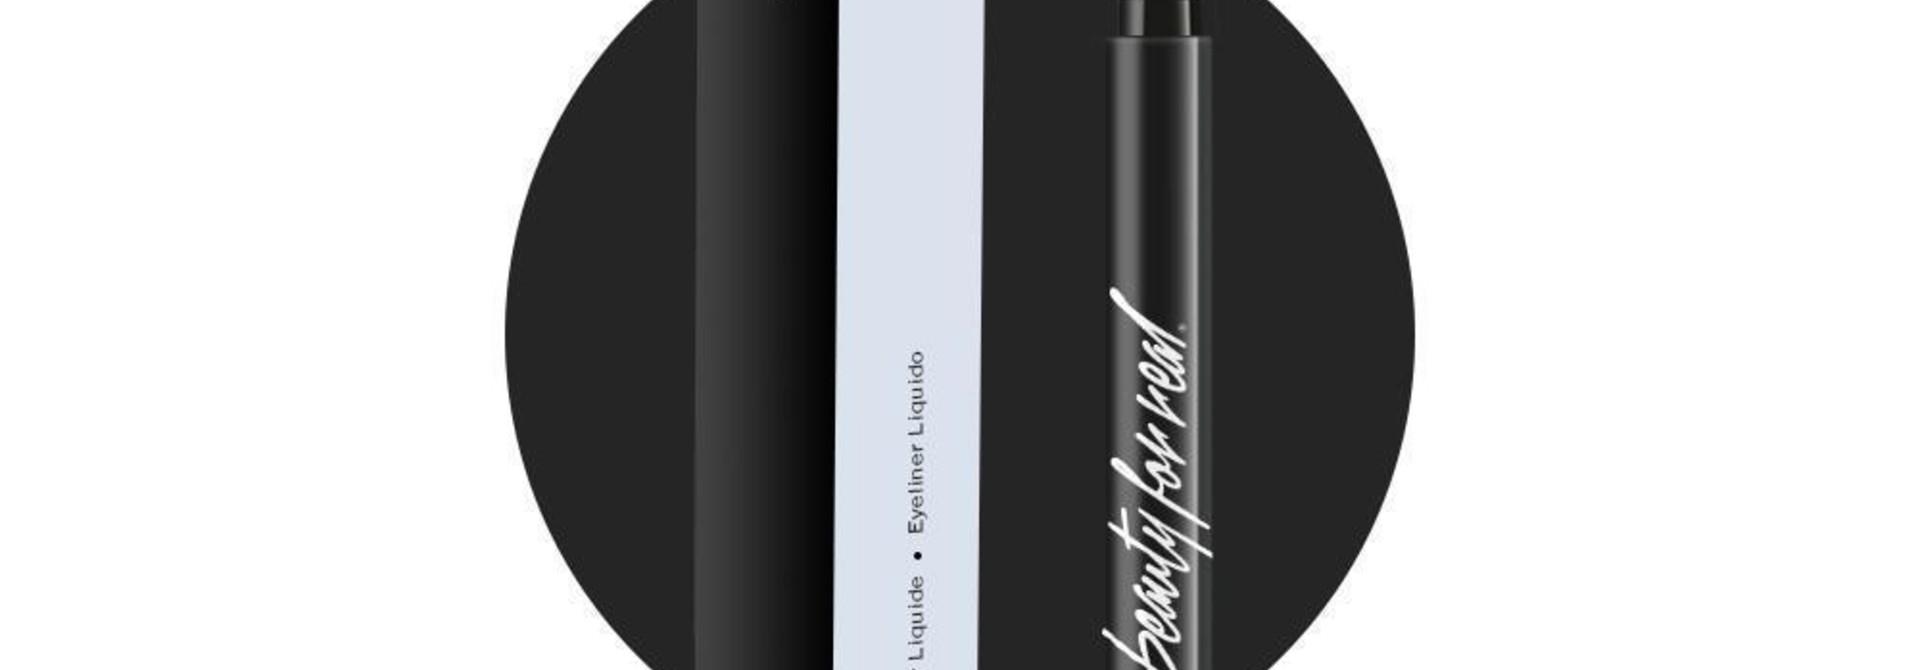 BFR FINISH LINE LIQUID EYELINER JET BLACK